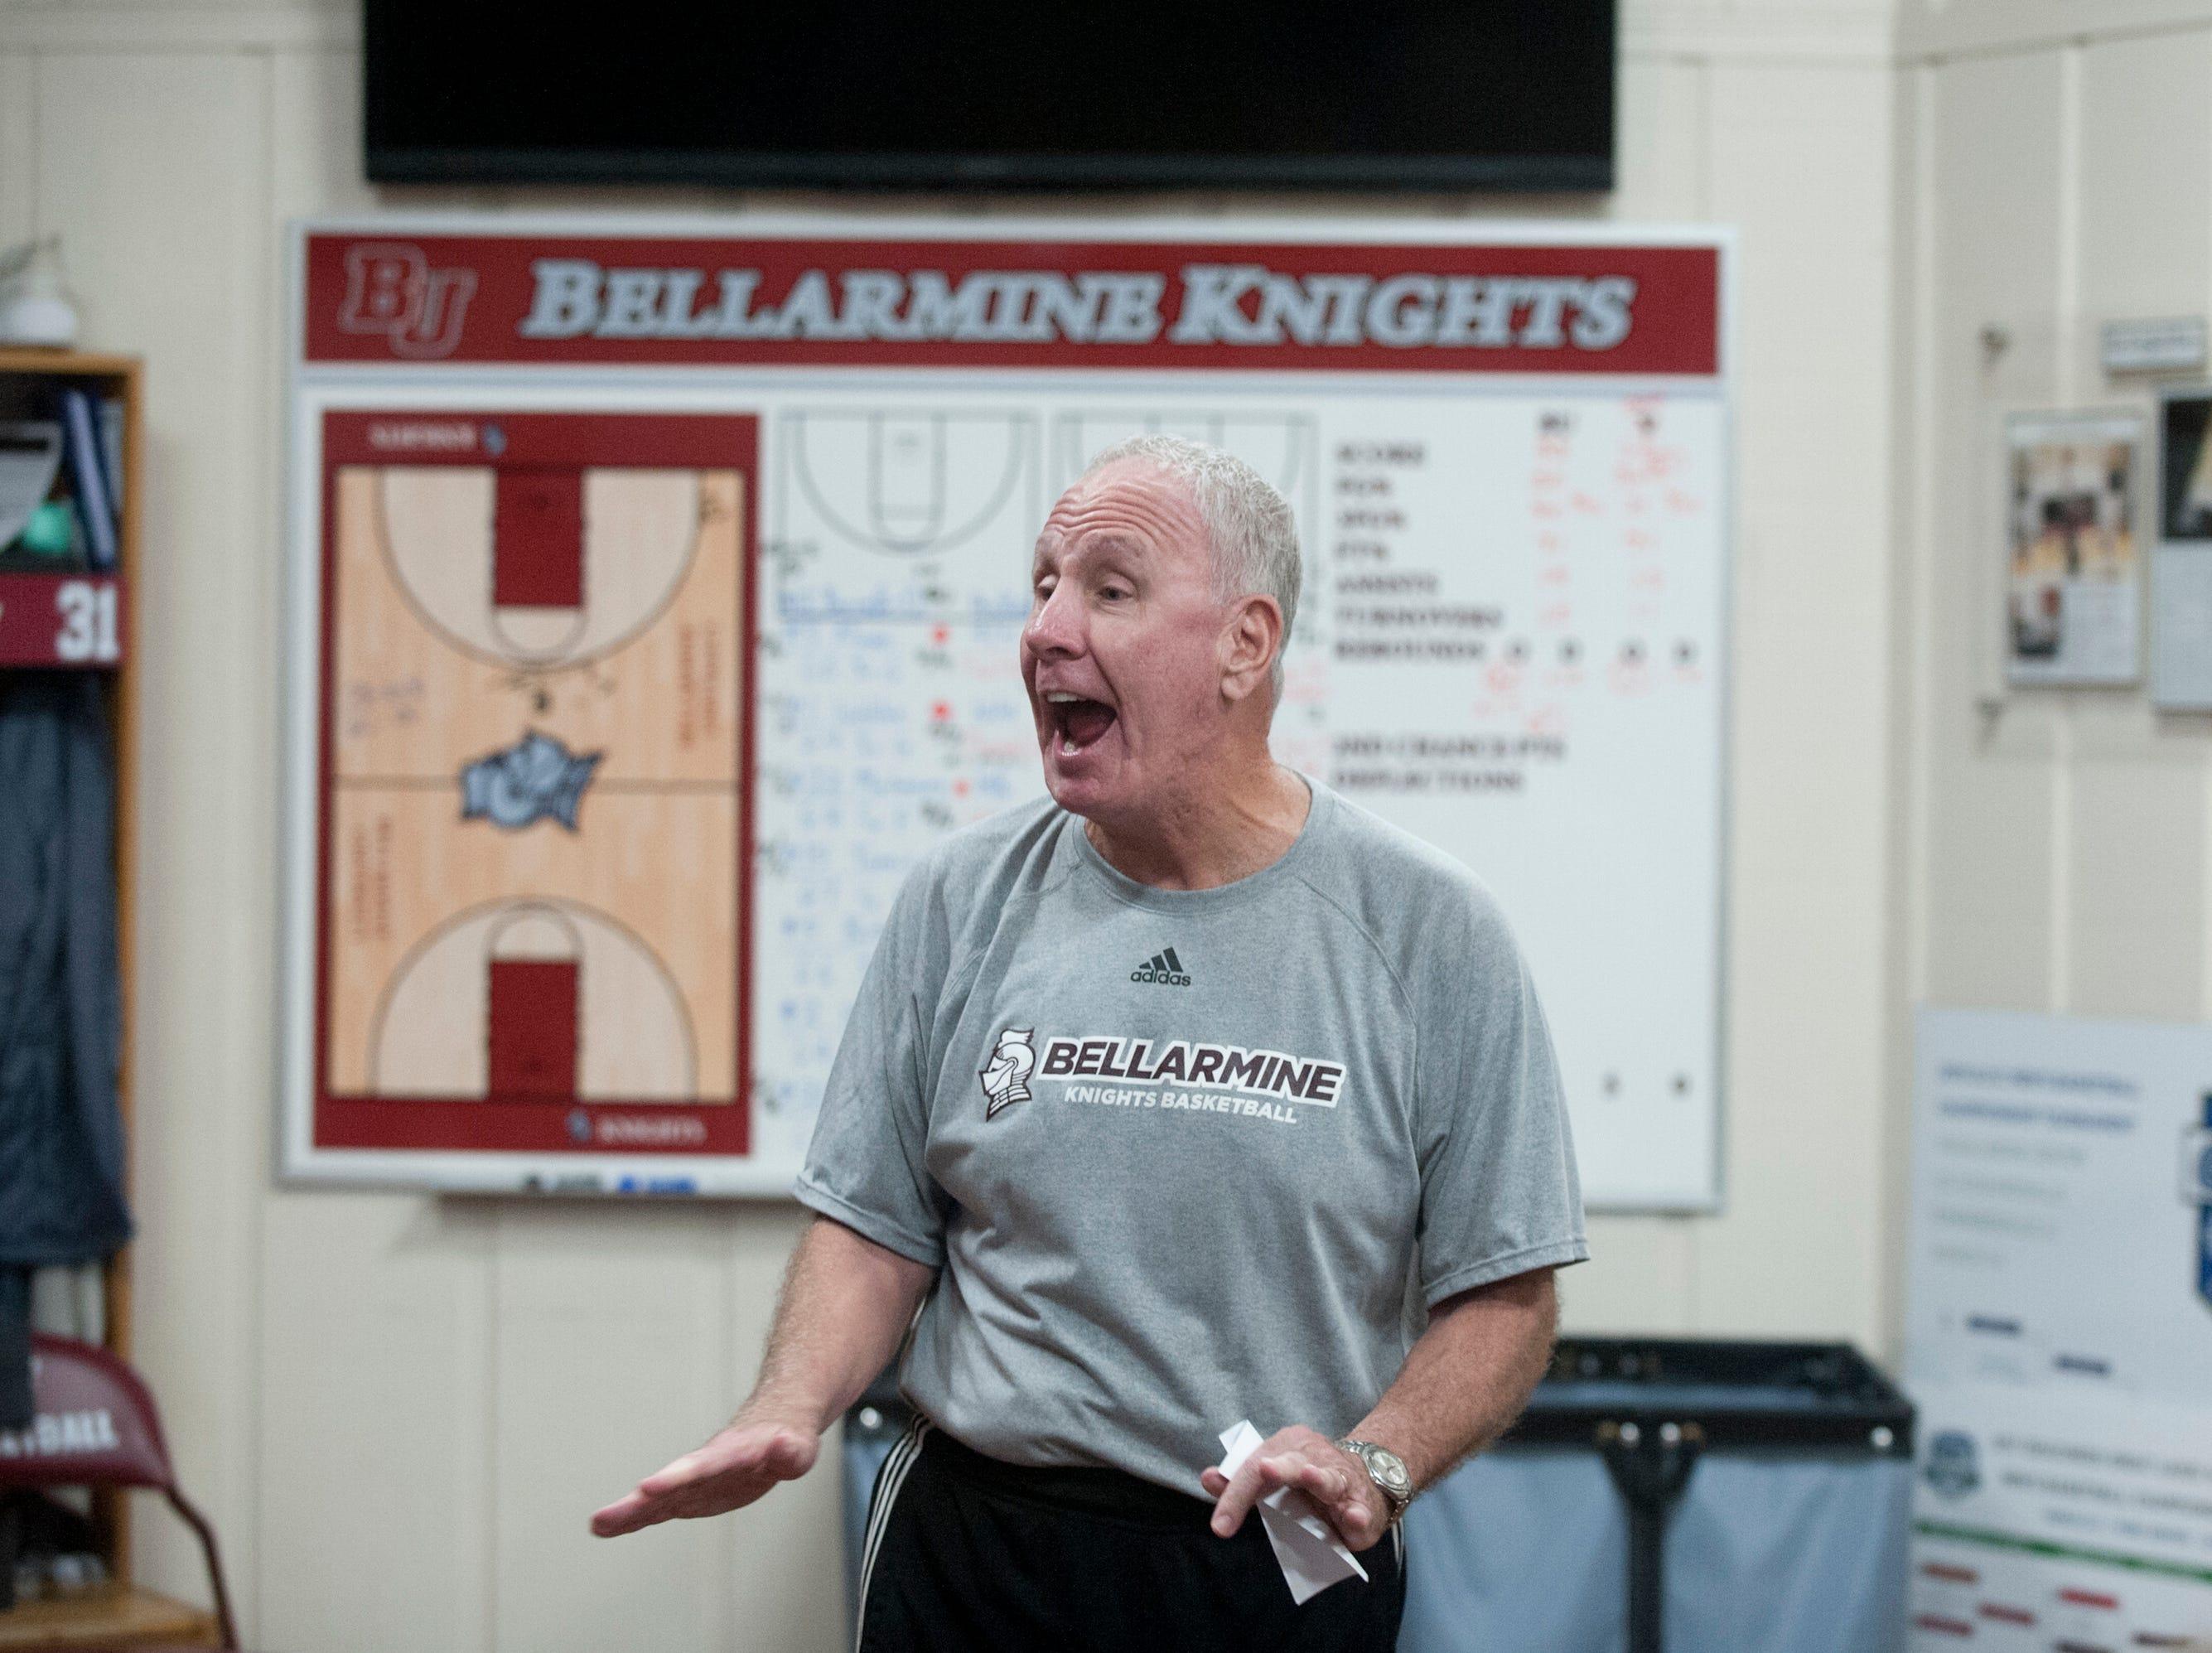 Bellarmine head basketball coach Scott Davenport speaks during an after-practice meeting with his team in their locker room.18 December 2018